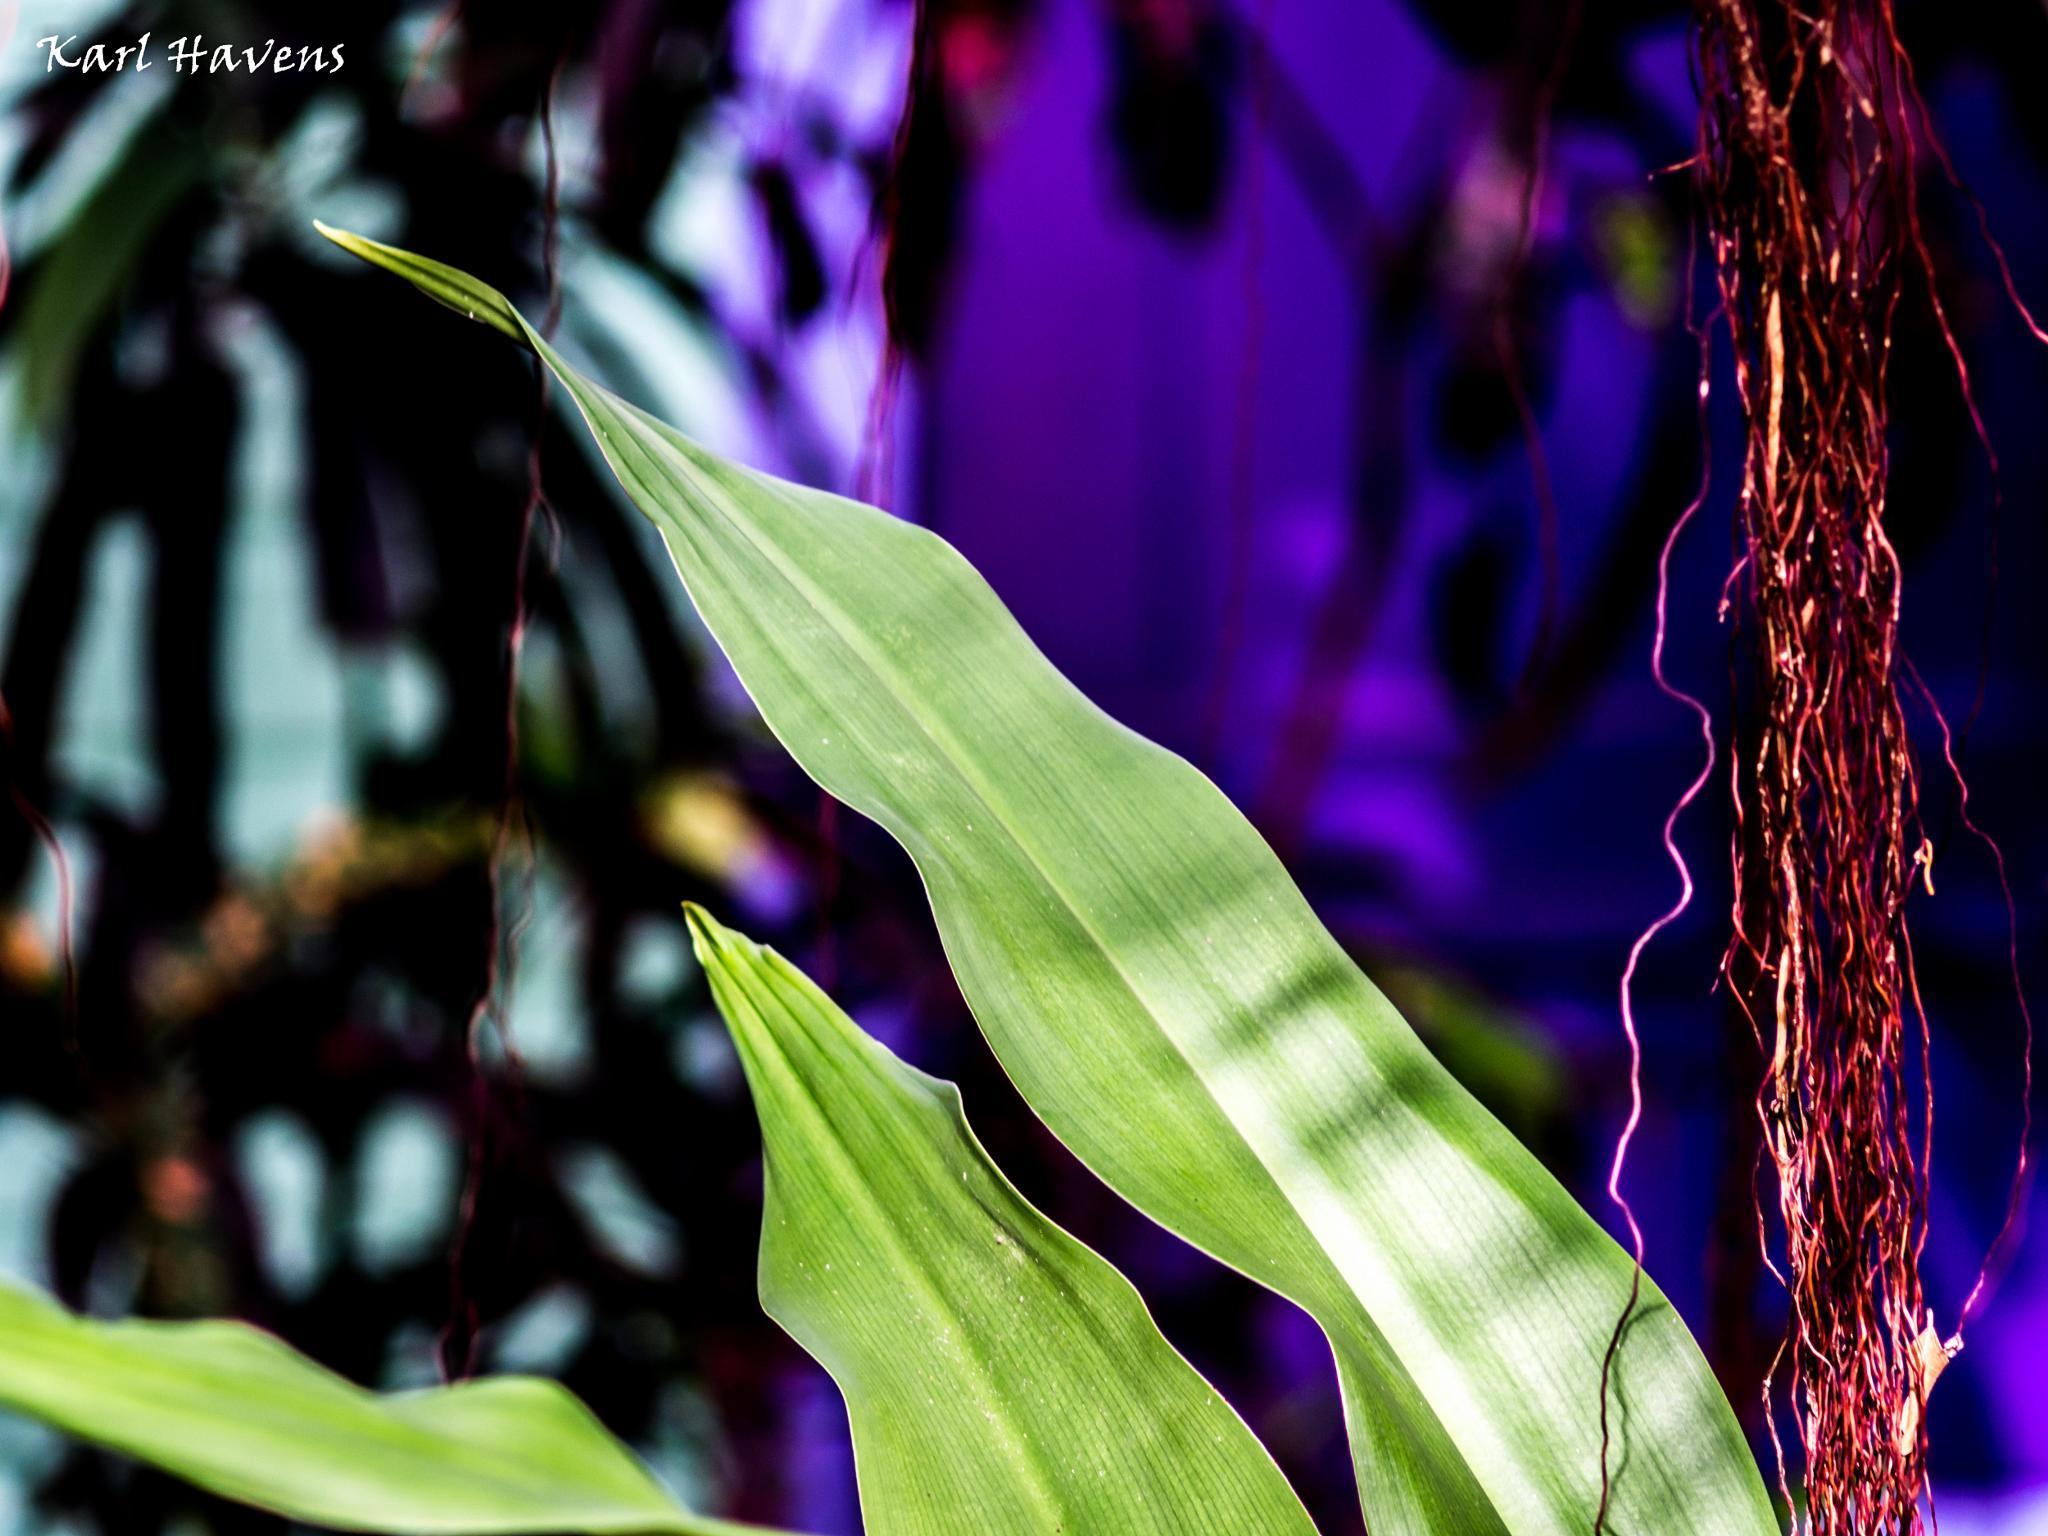 Tropiccal Bokeh by karl.havens